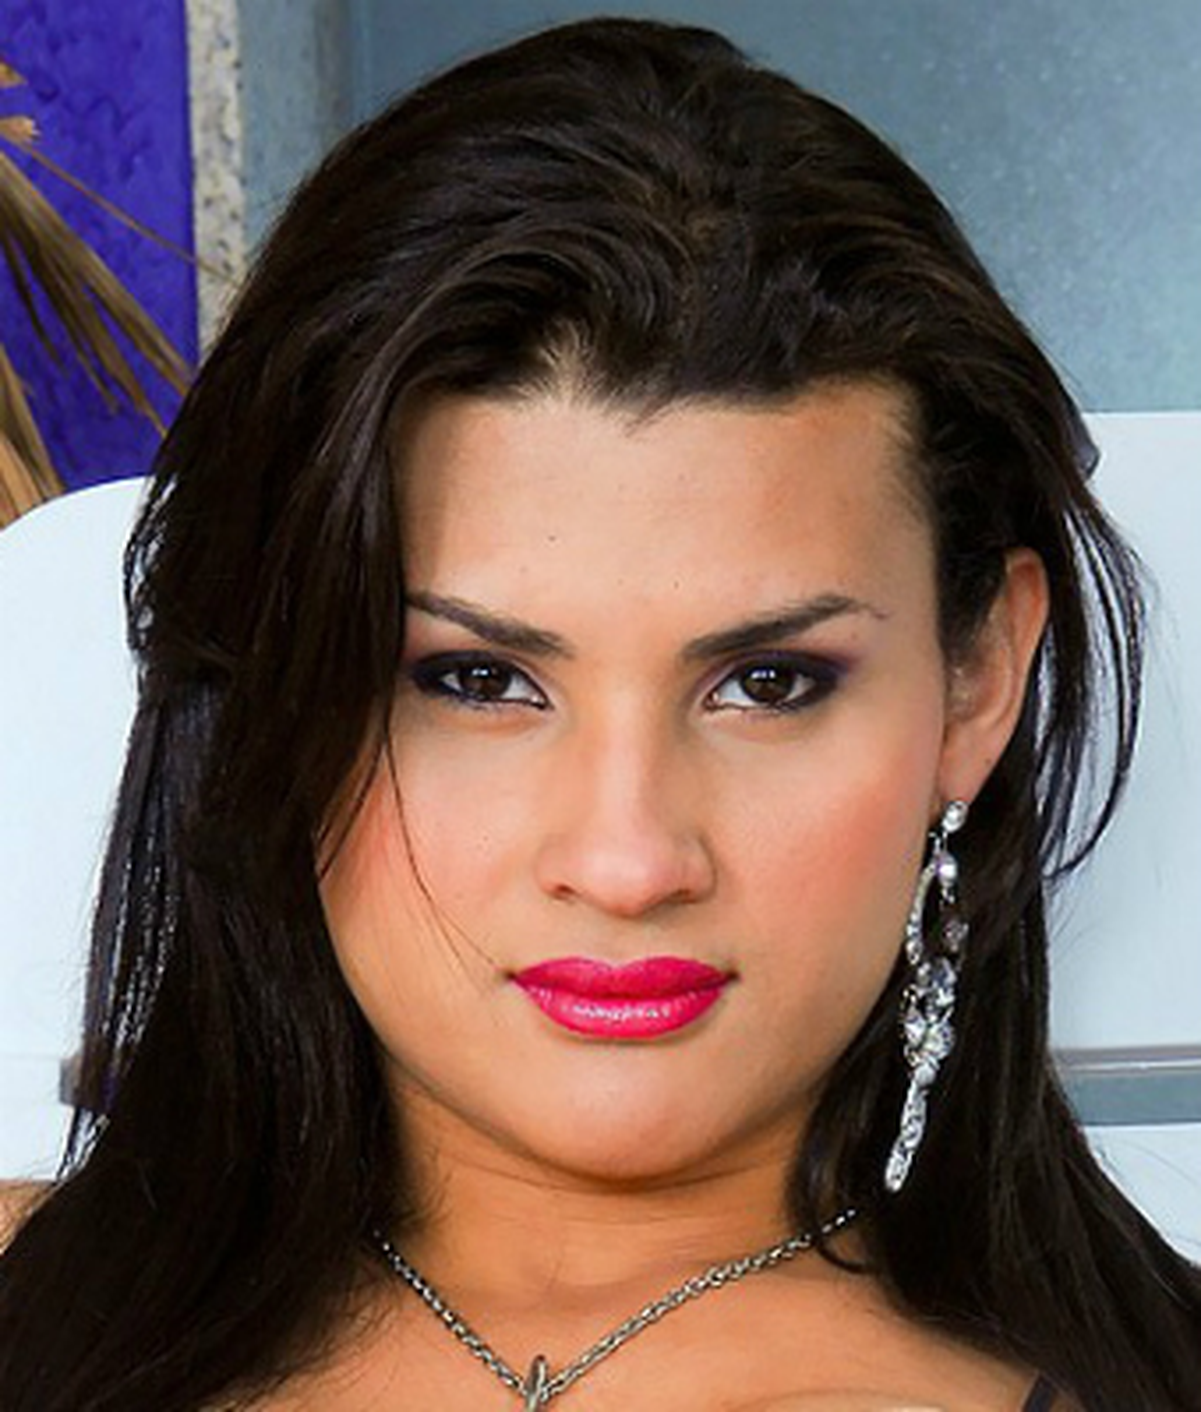 Alinne Garcia wiki, Alinne Garcia bio, Alinne Garcia news